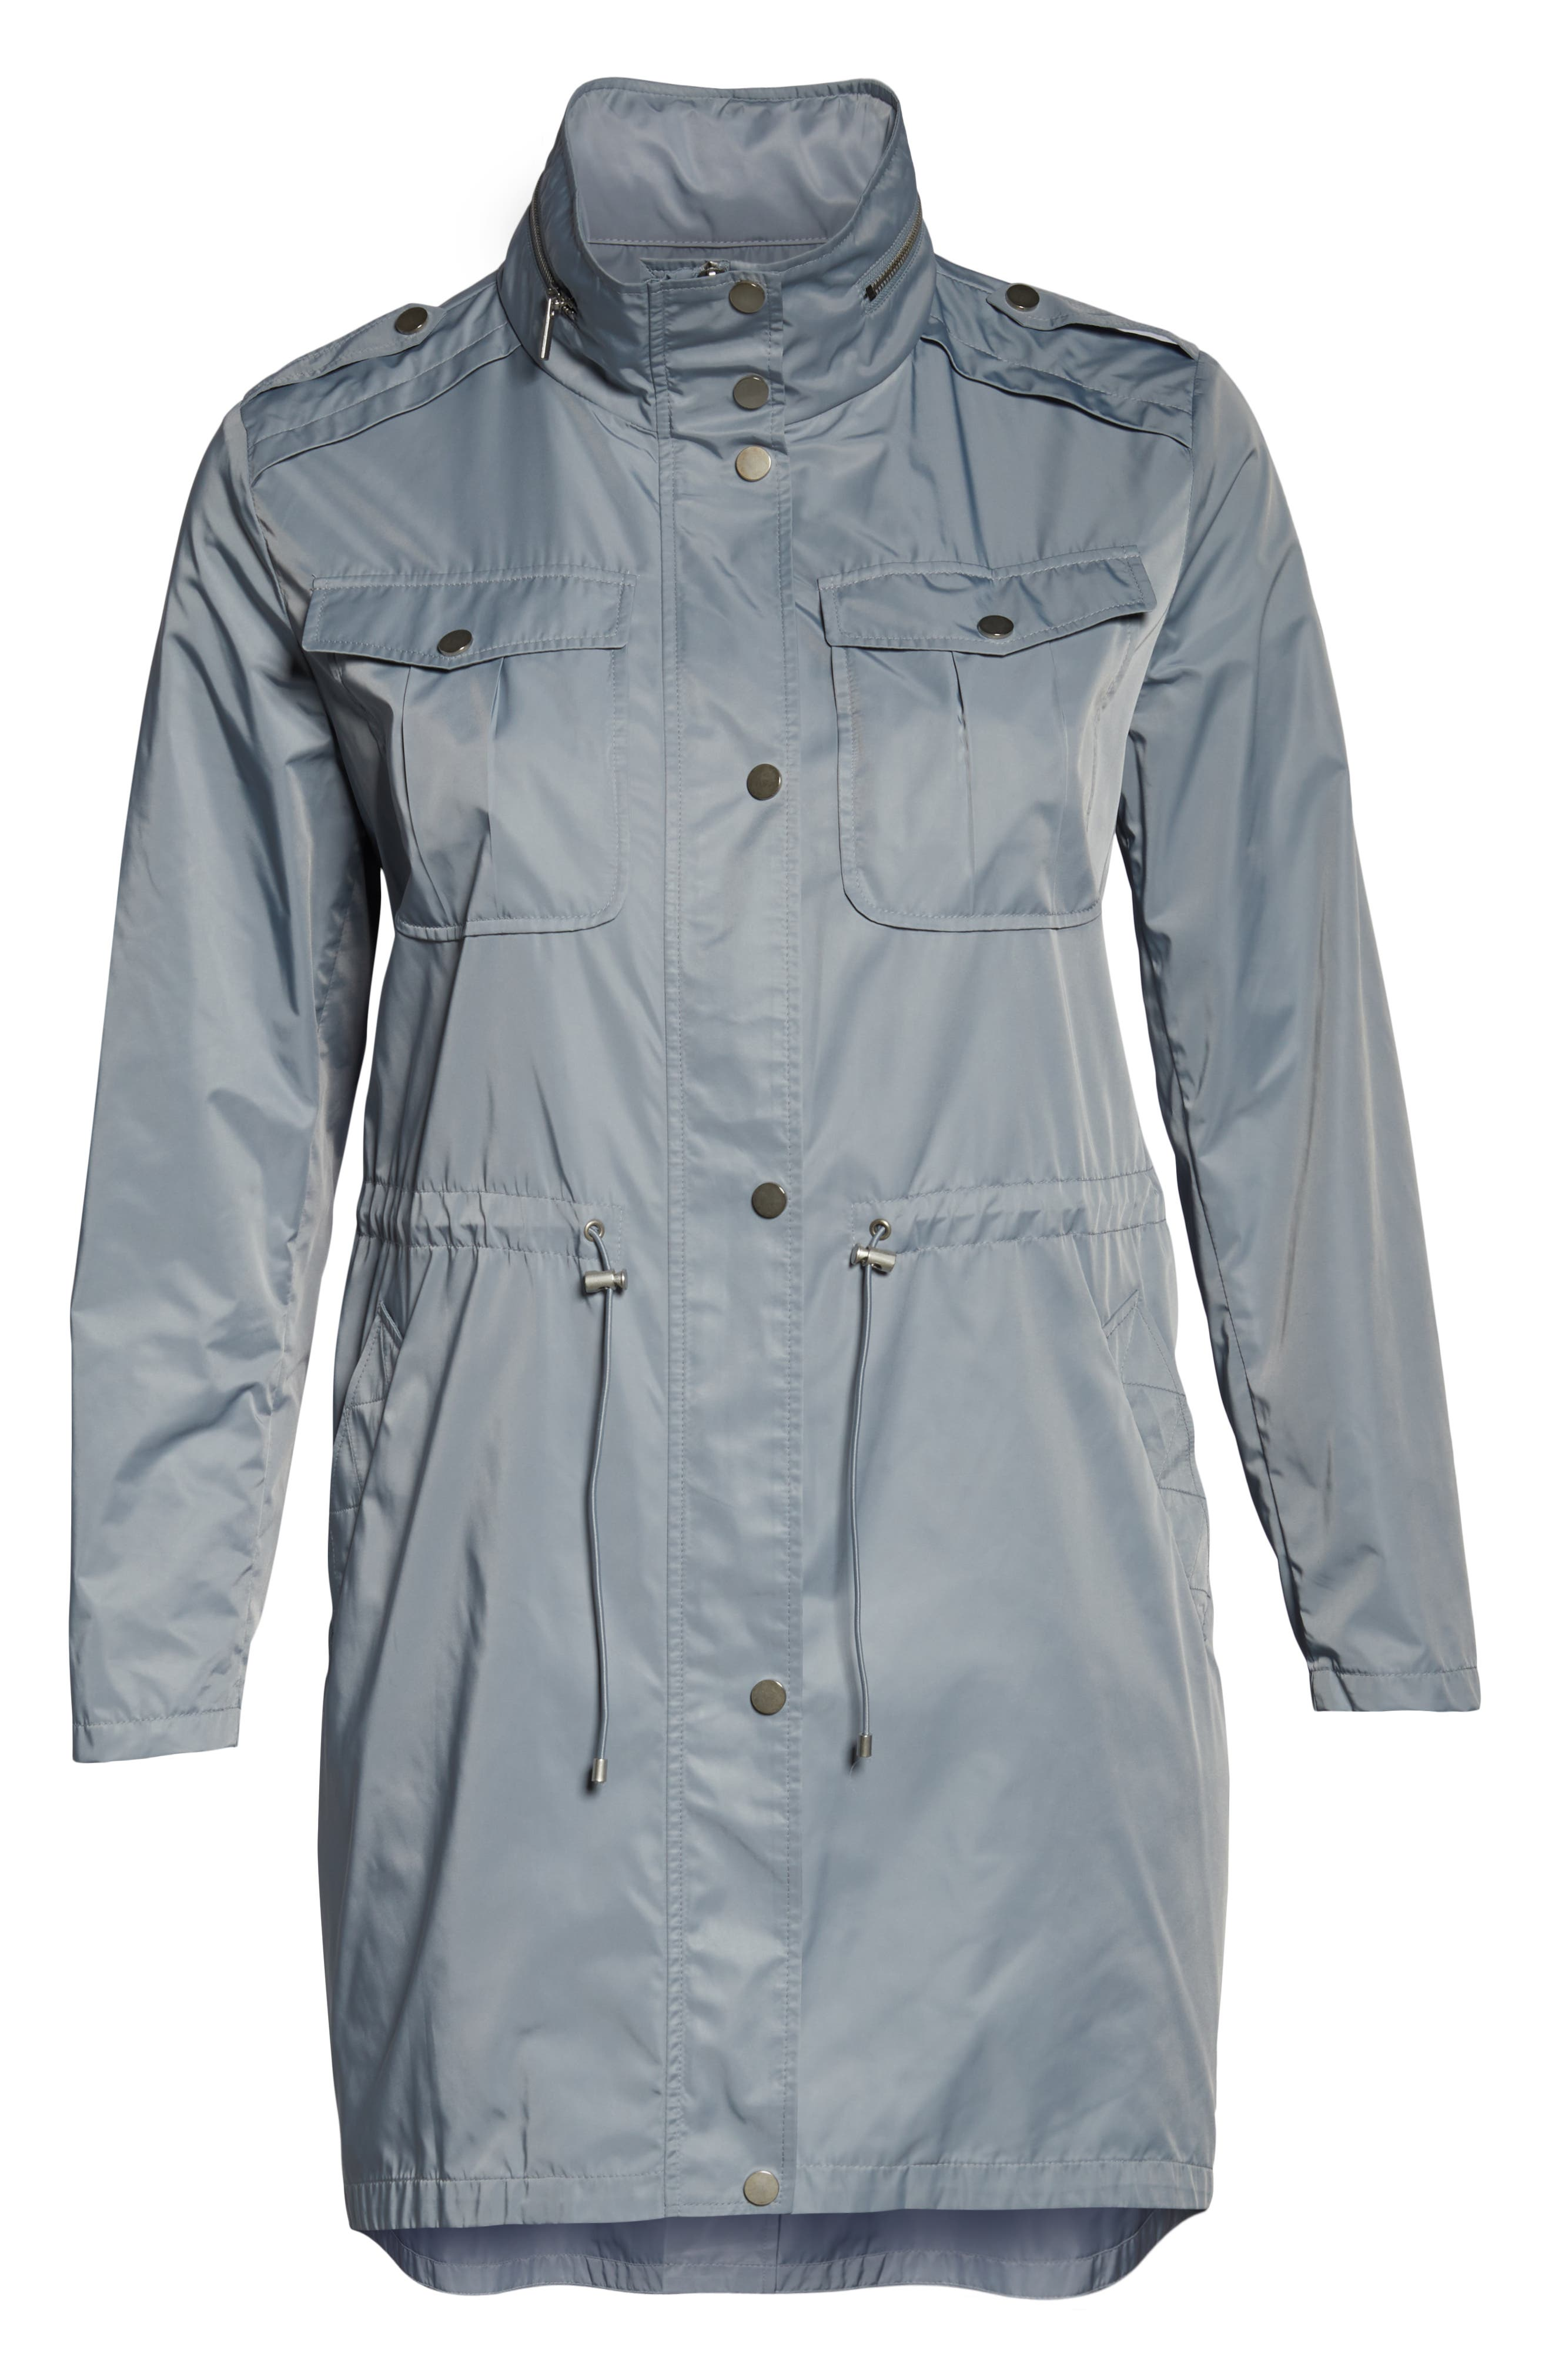 36dd7667564 Women s Badgley Mischka Collection Coats   Jackets